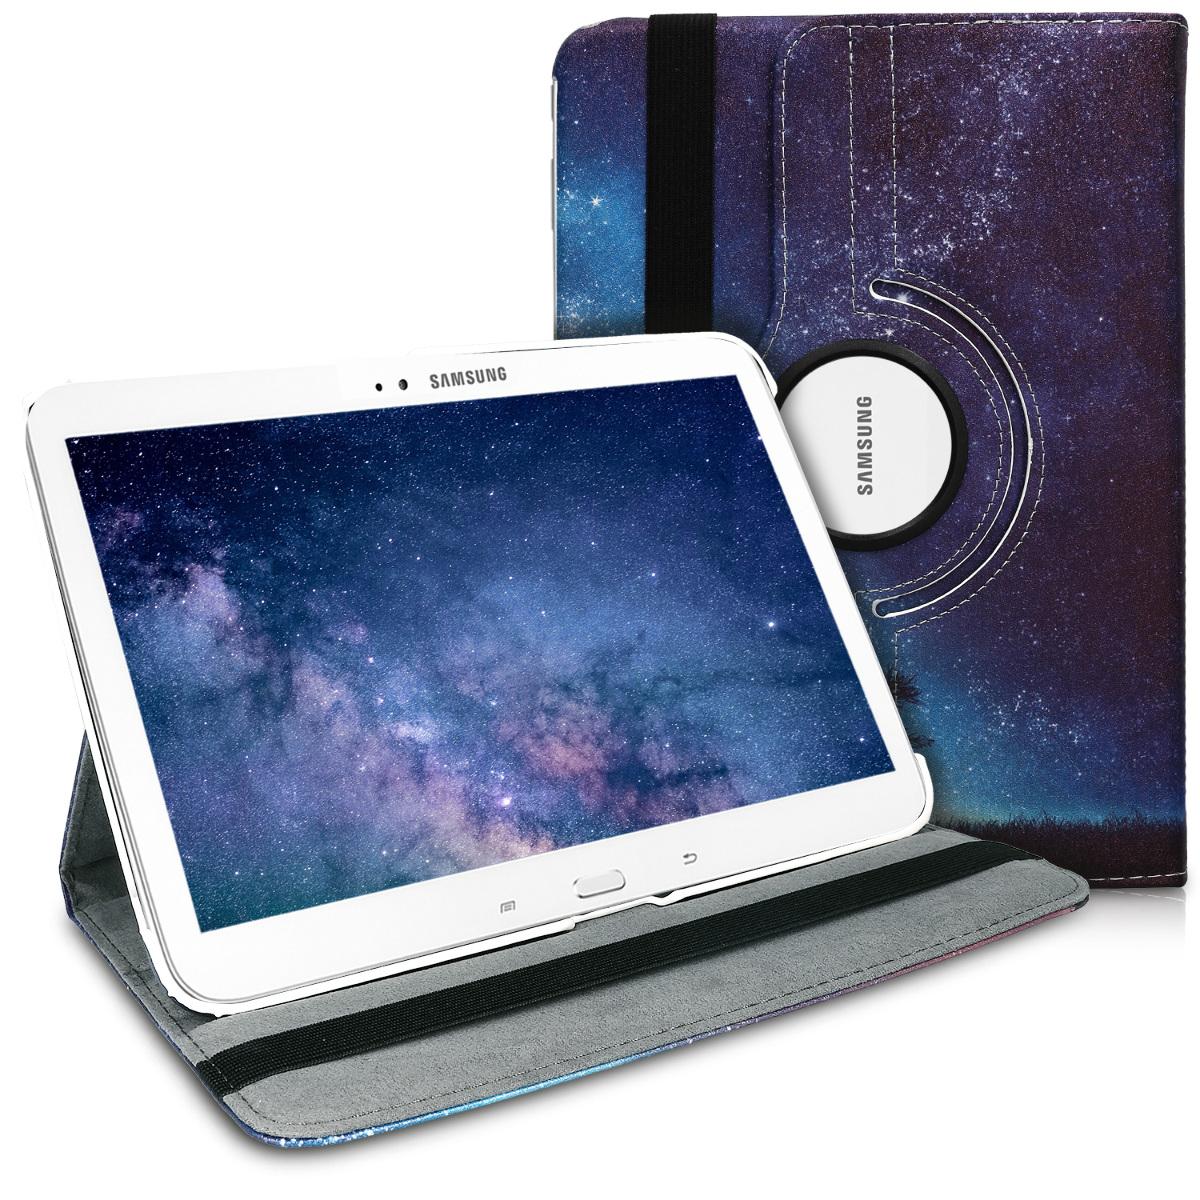 KW Θήκη 360° Samsung Galaxy Tab 3 10.1 - Μαύρο/Μπλε/Γκρι (17318.17)